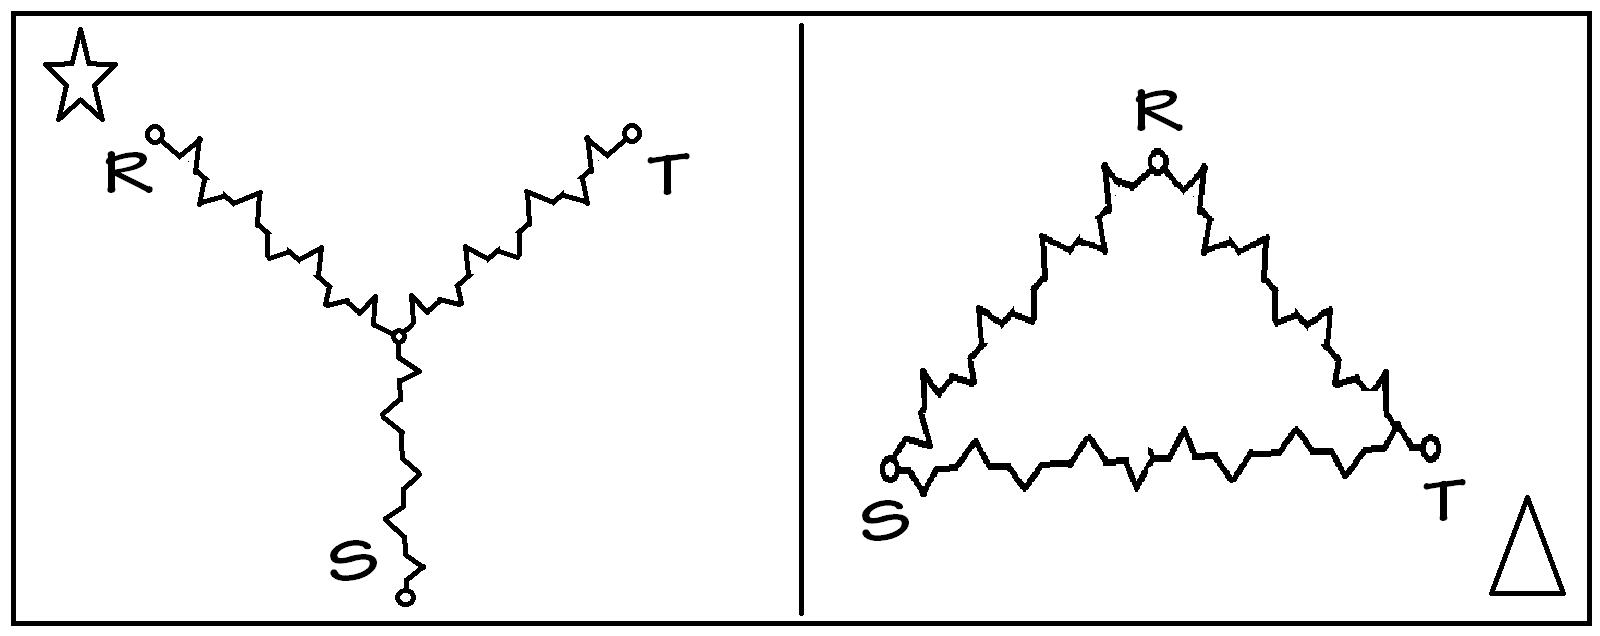 Wiring Diagram Star Delta Bintang Segitiga